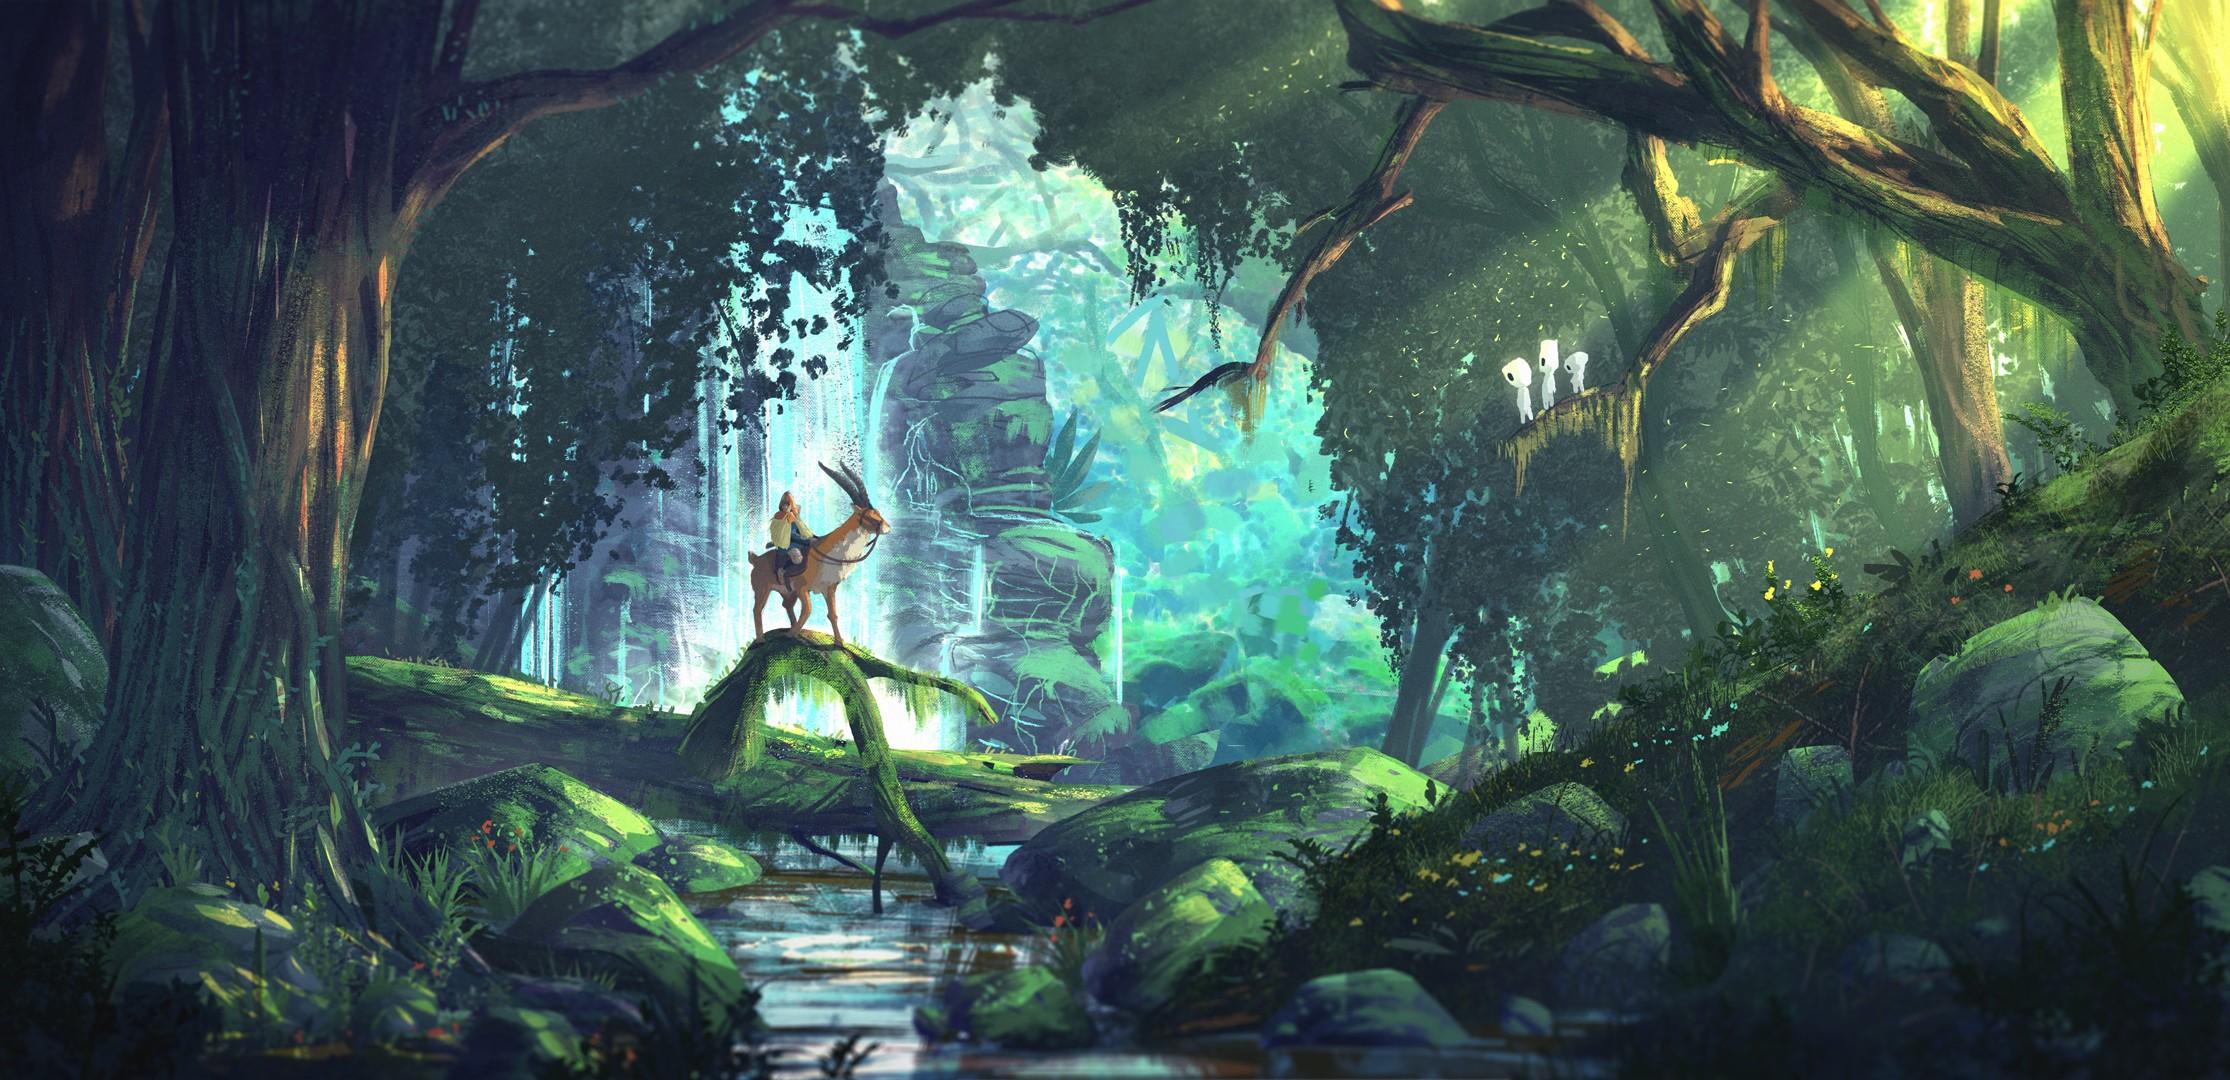 wallpaper forest fantasy art anime cave princess mononoke